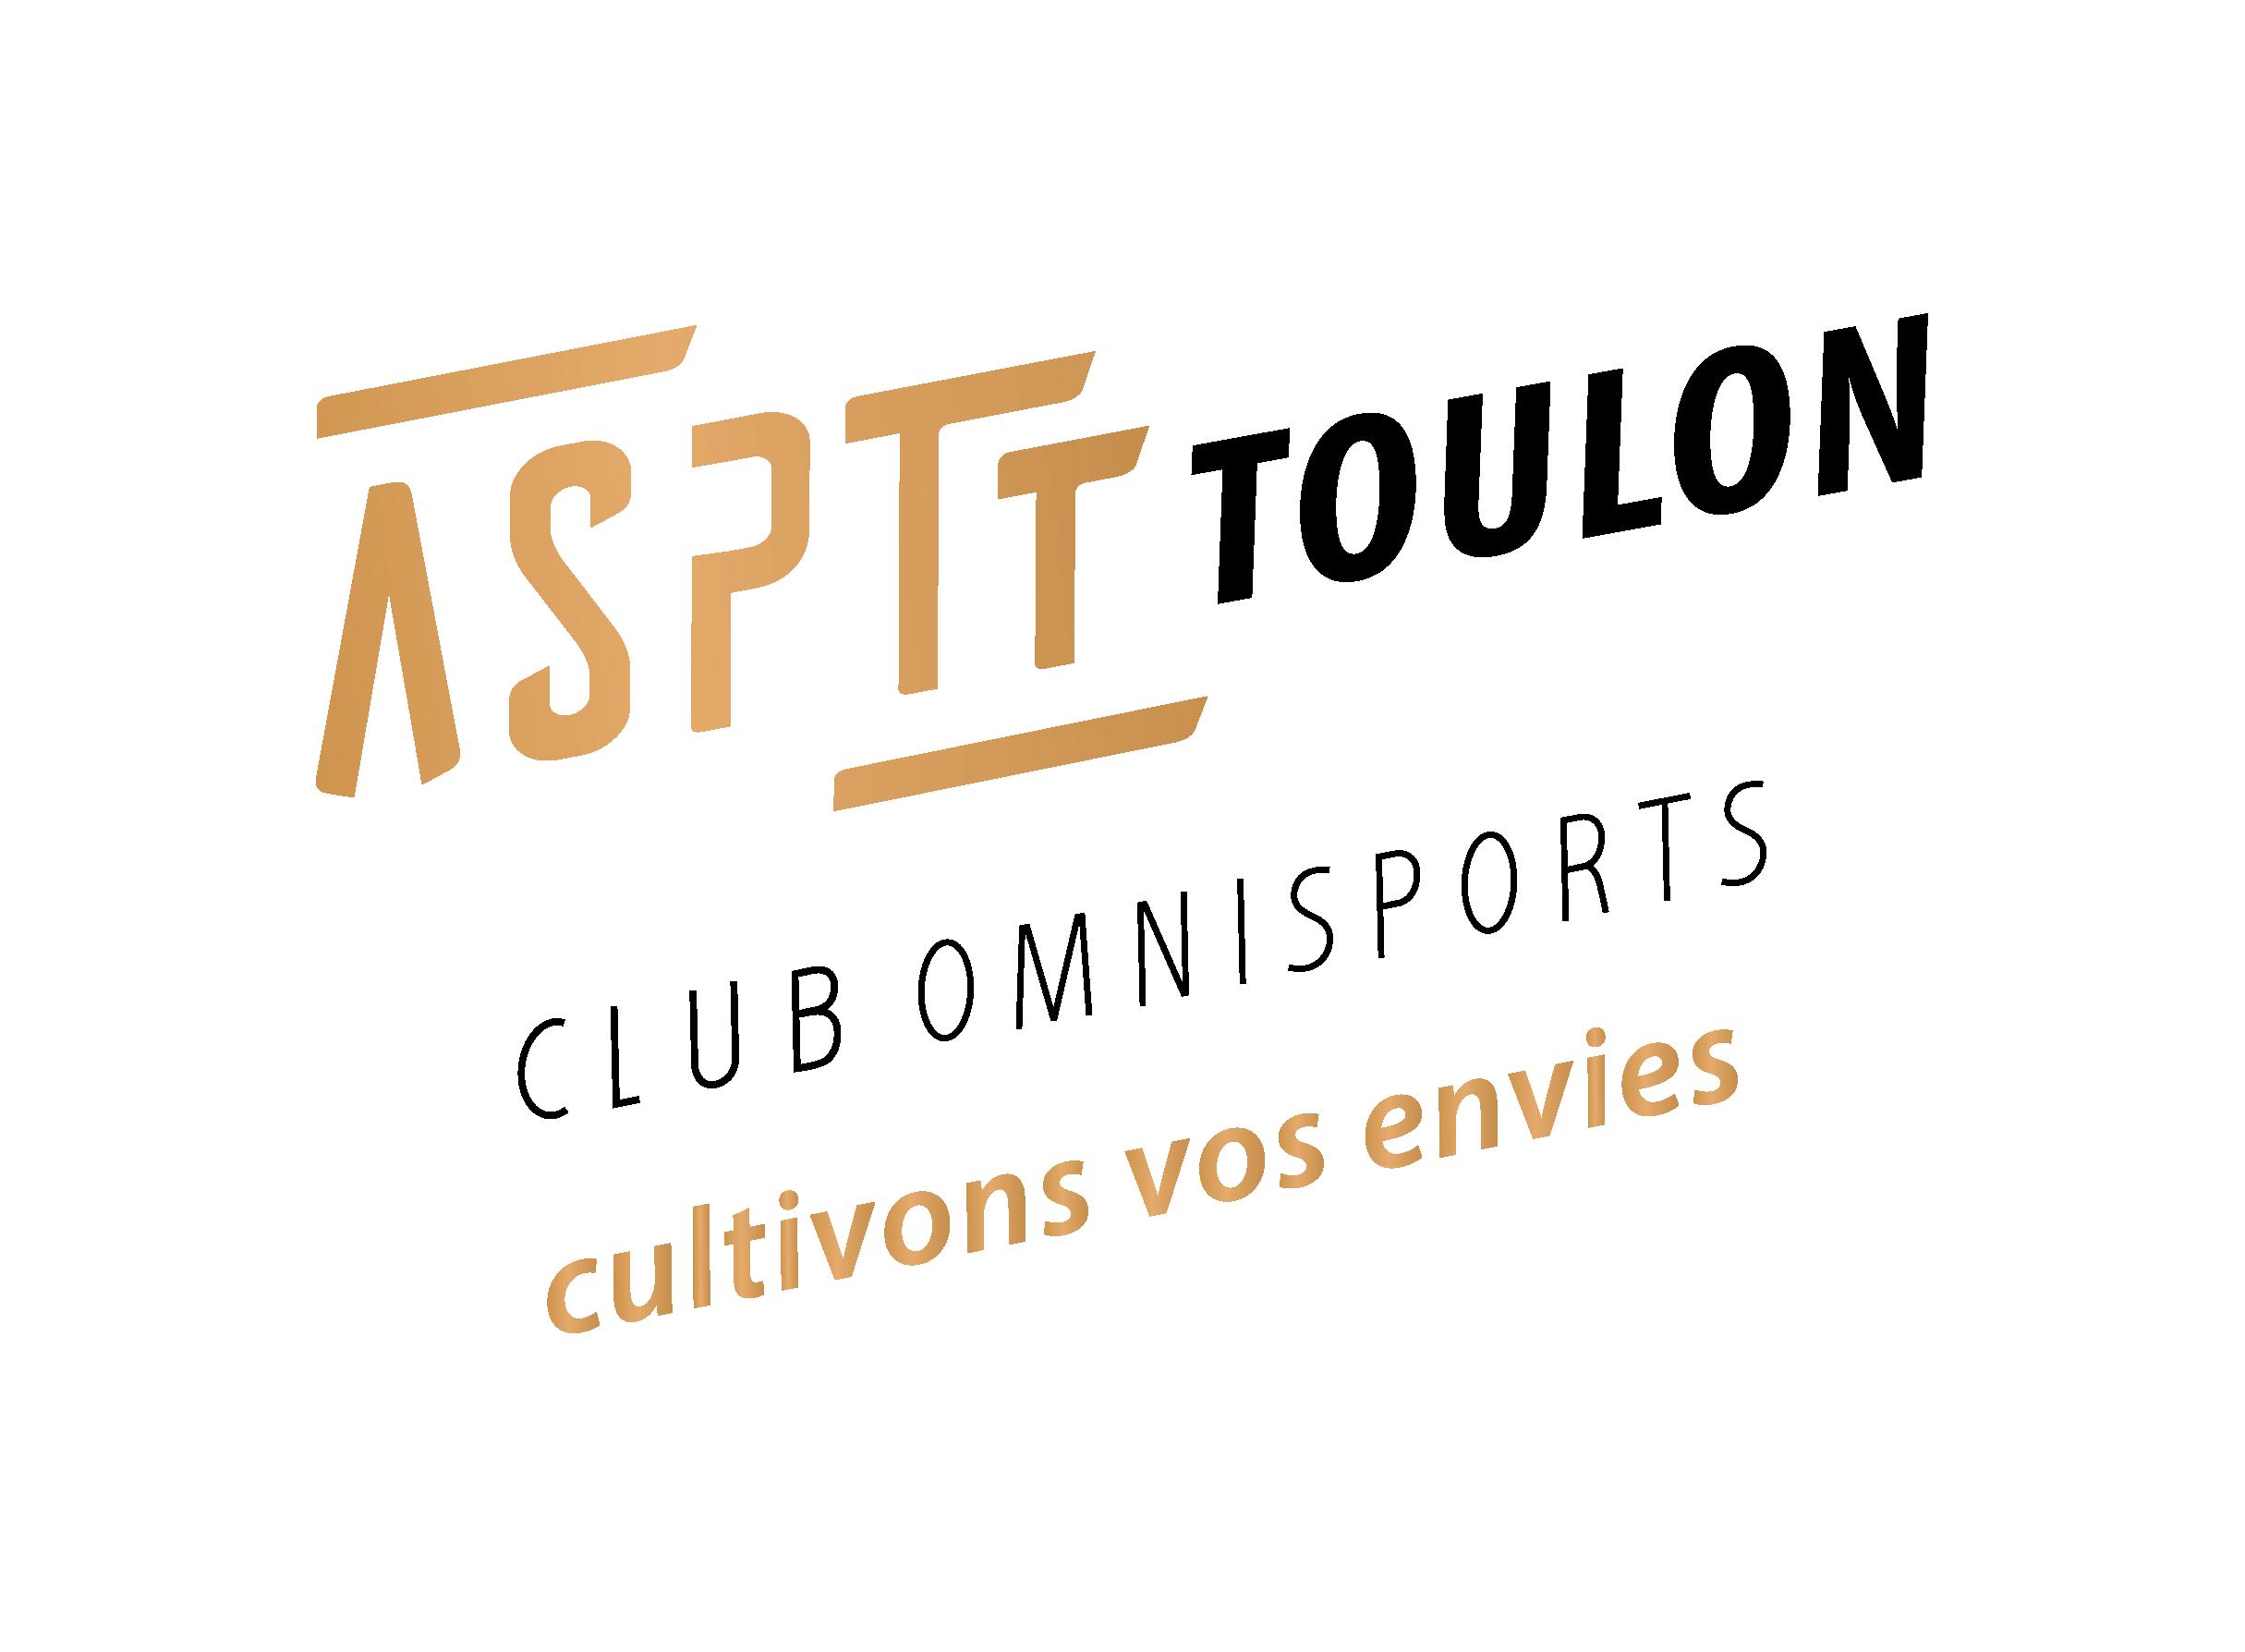 ASPTT Toulon